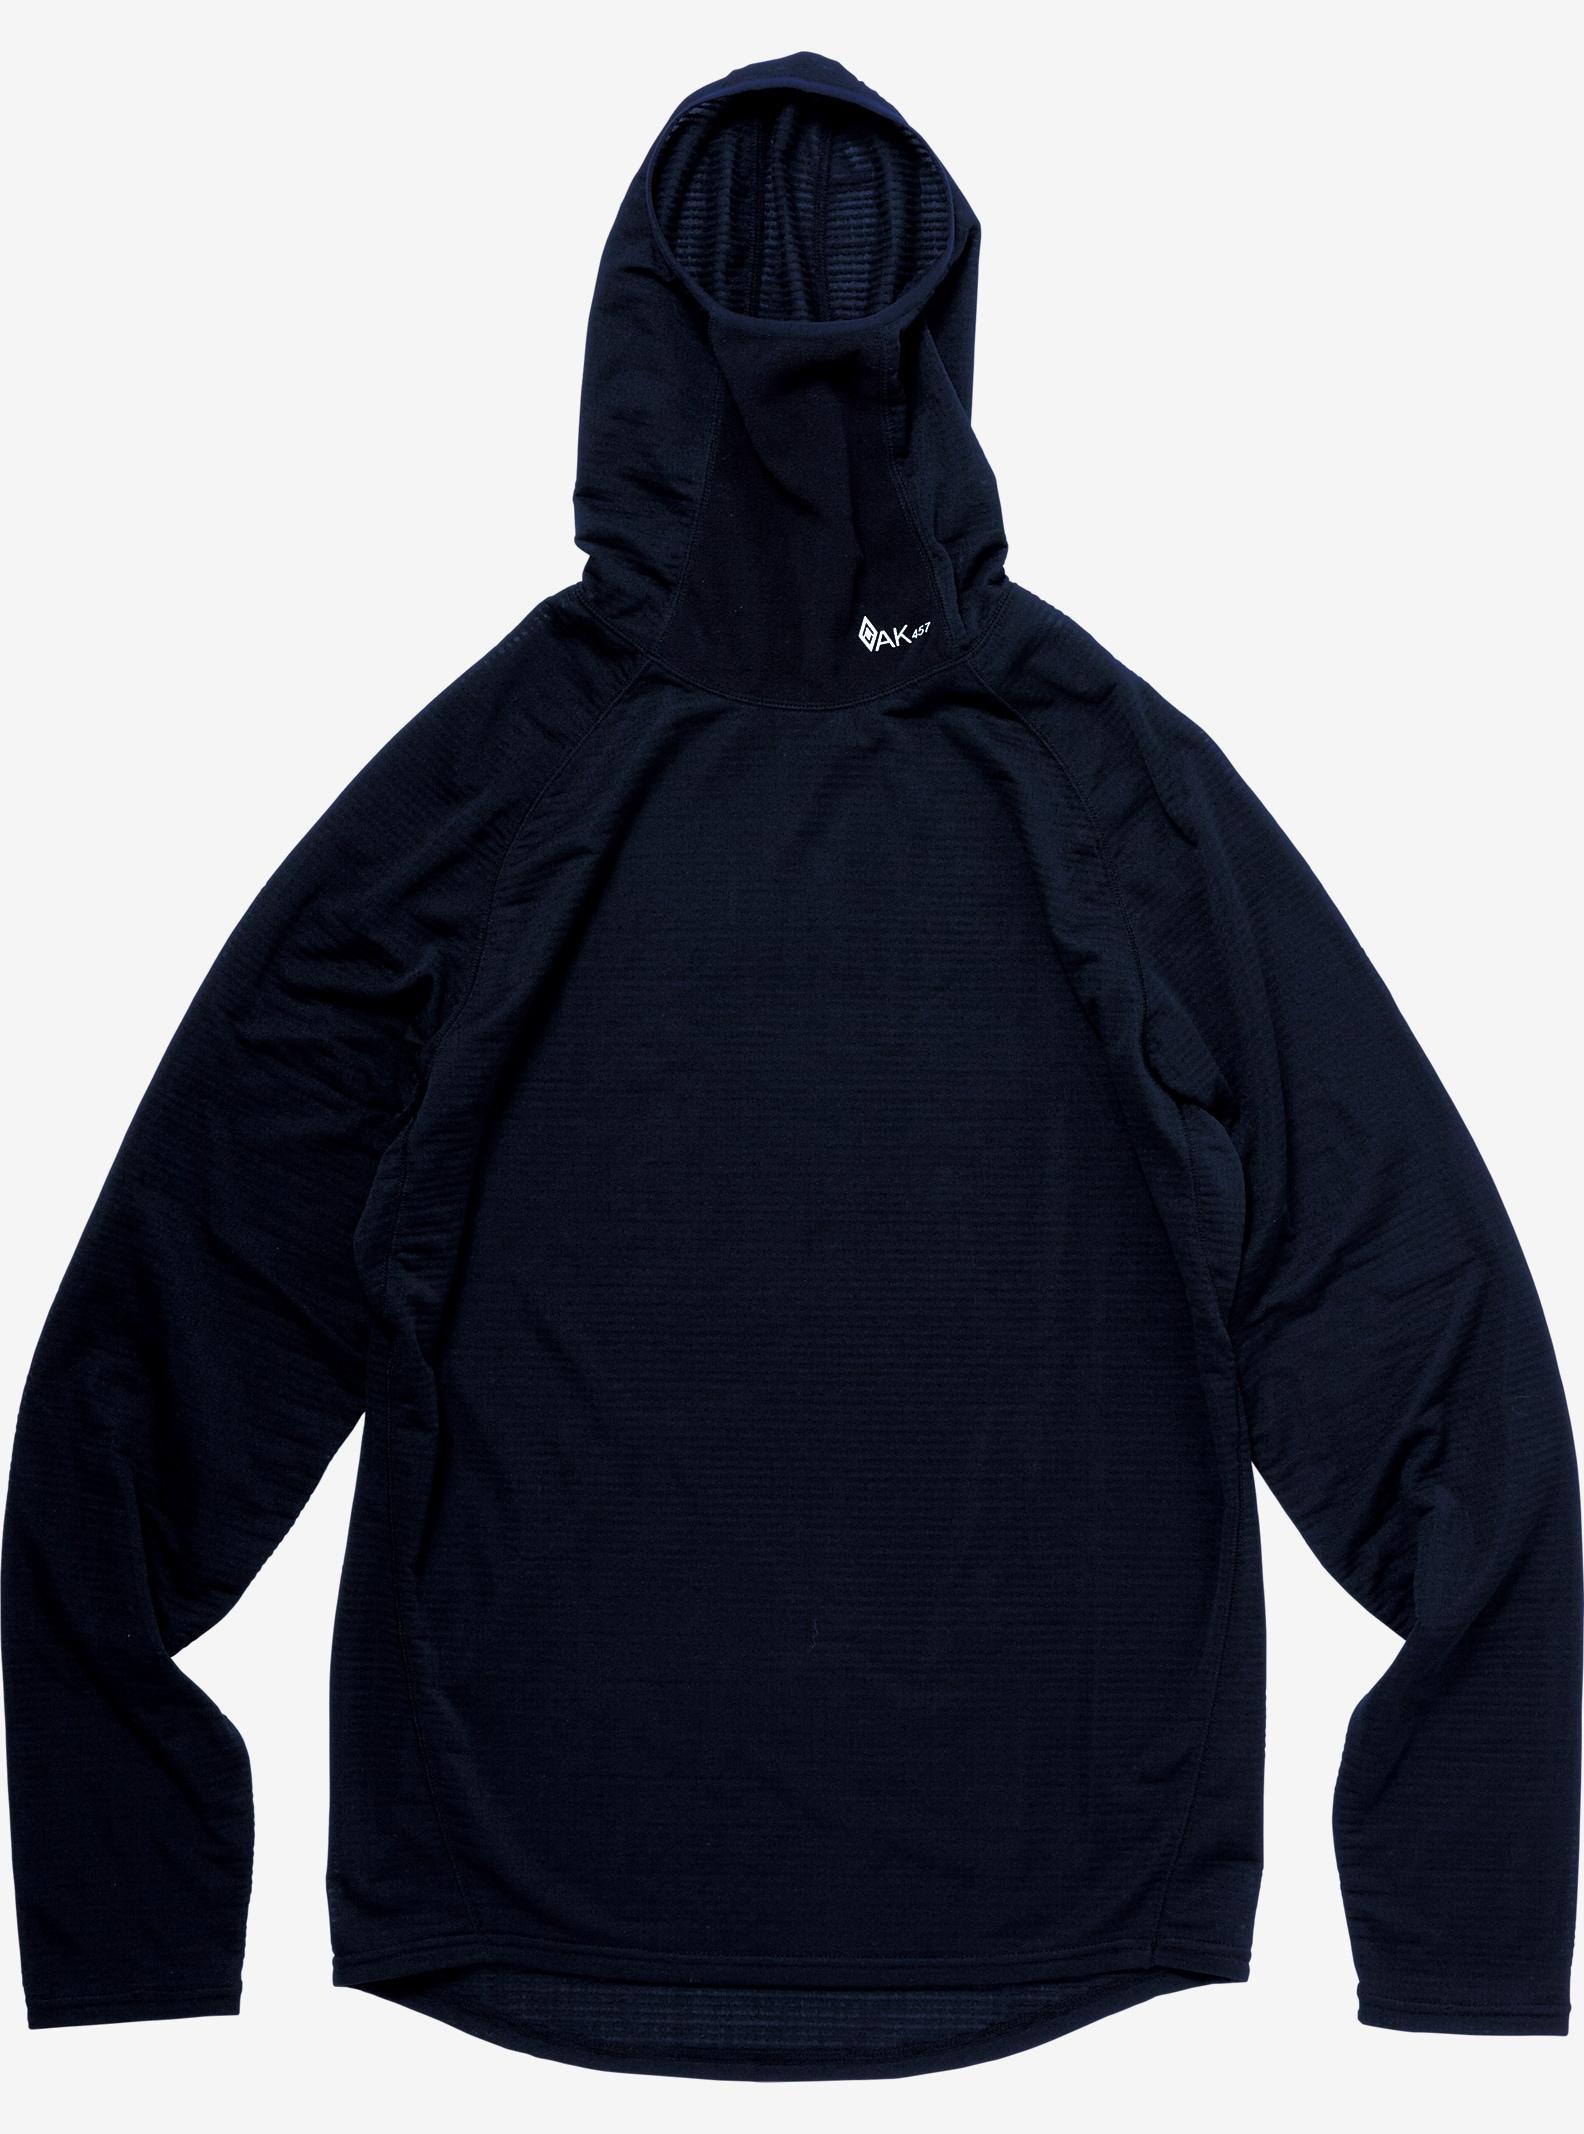 Burton AK457 Base Layer Hi Neck Fleece Top shown in True Black